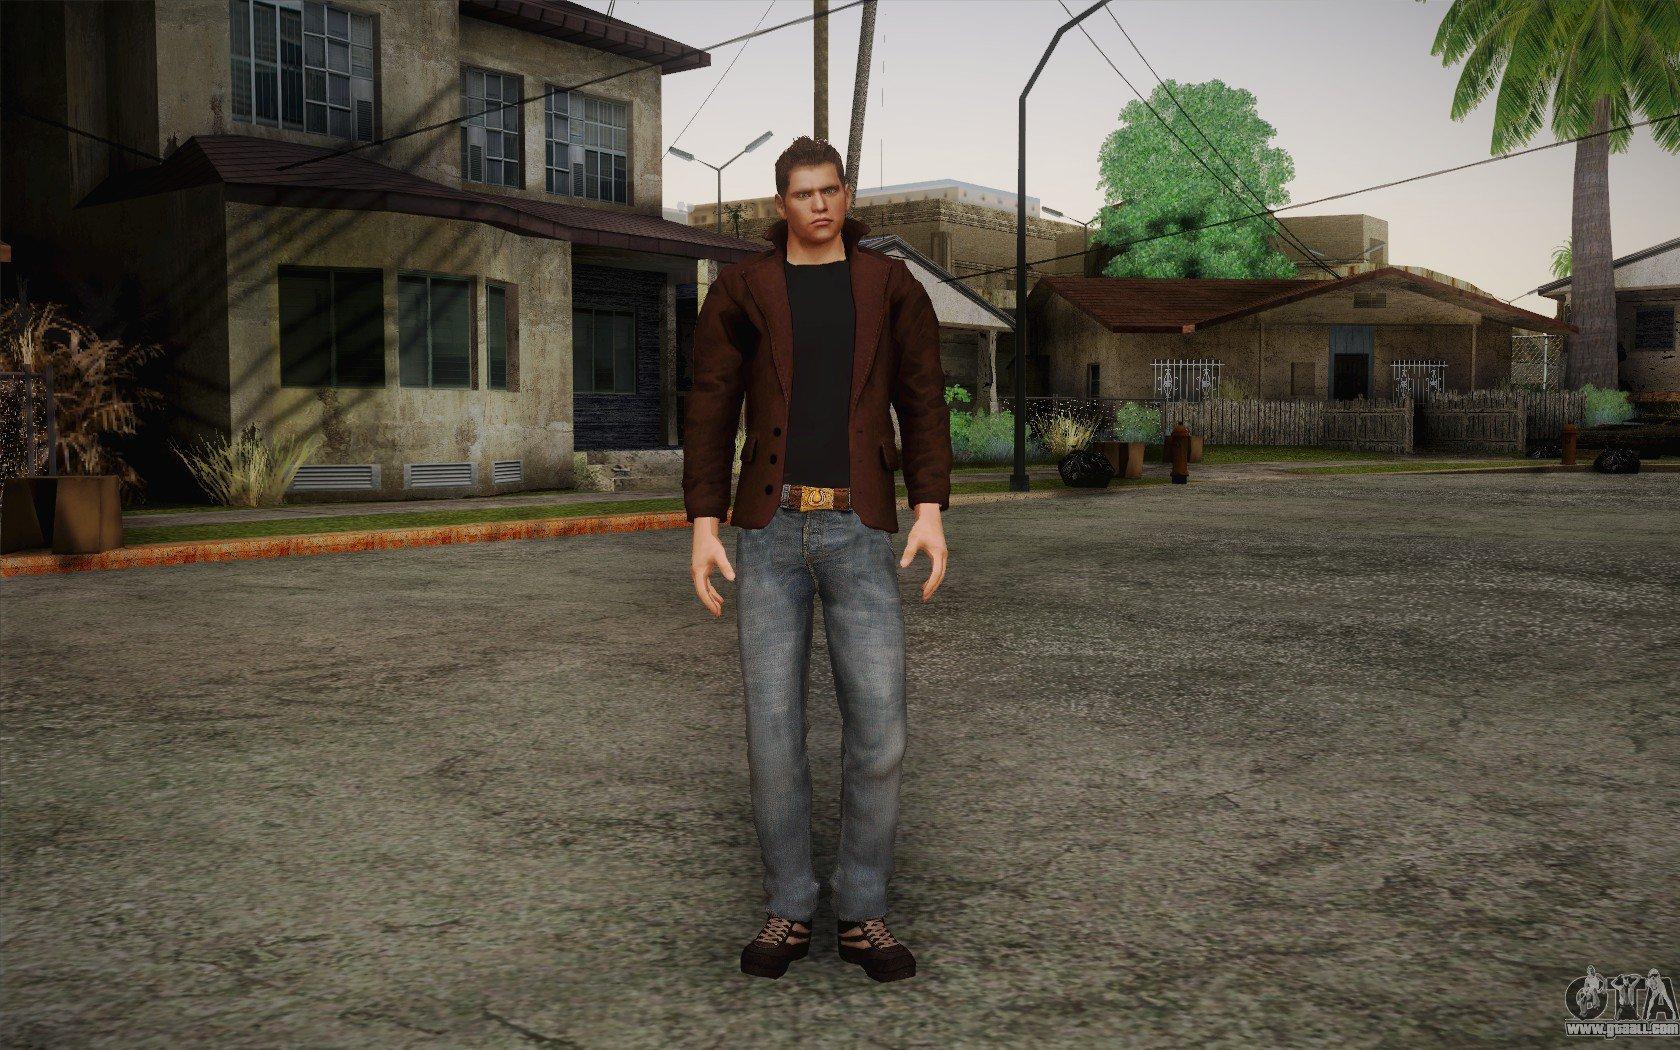 dean winchester pedestrian file - GTA Supernatural mod for Grand